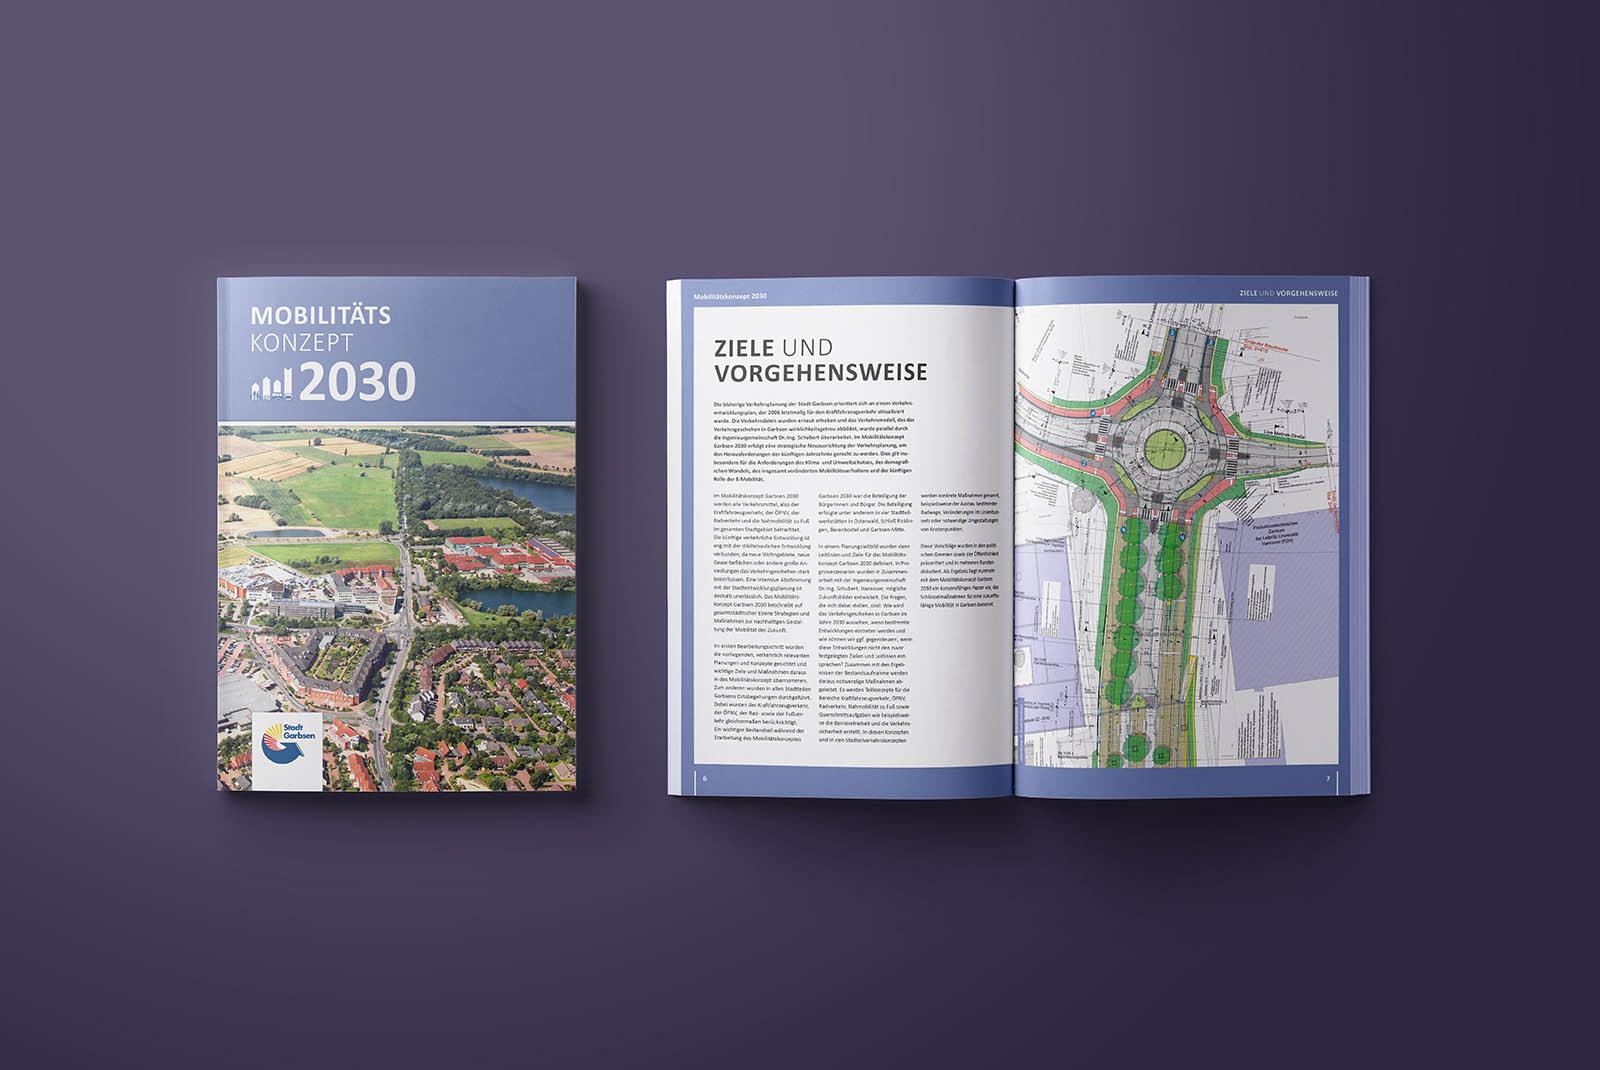 Mobilitätskonzept 2030